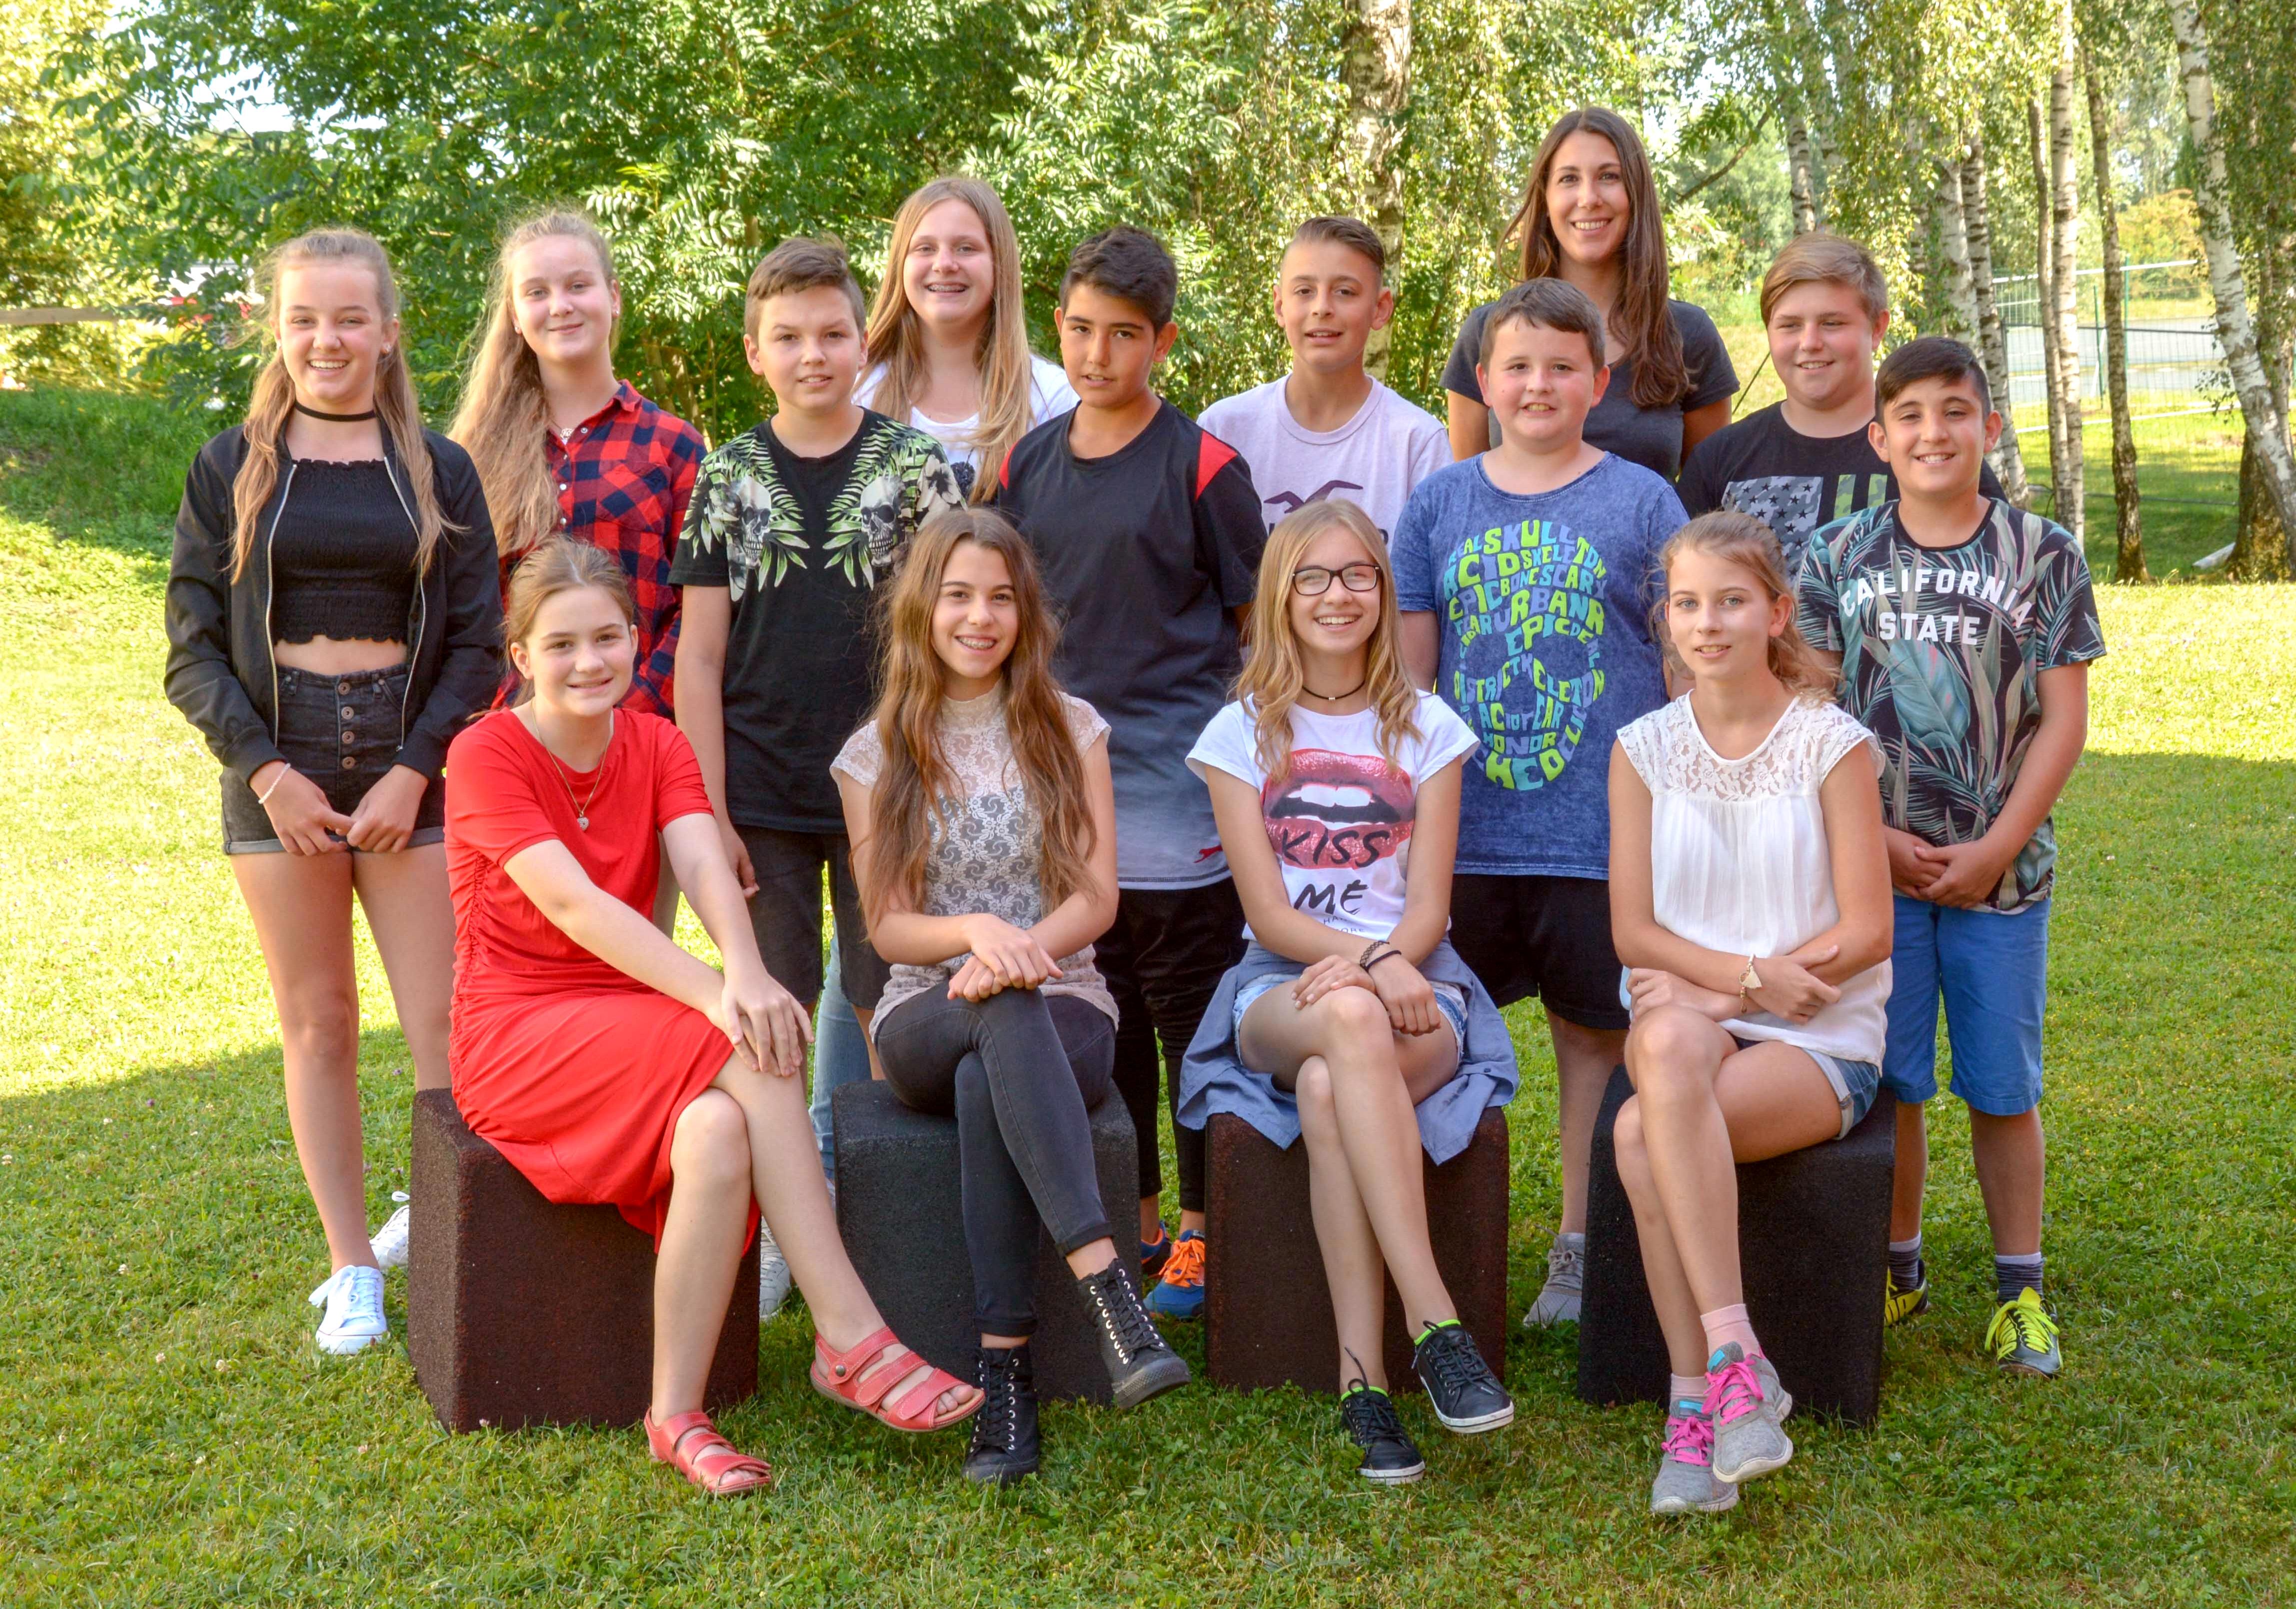 Neue Mittelschule Bürmoos - Schüler